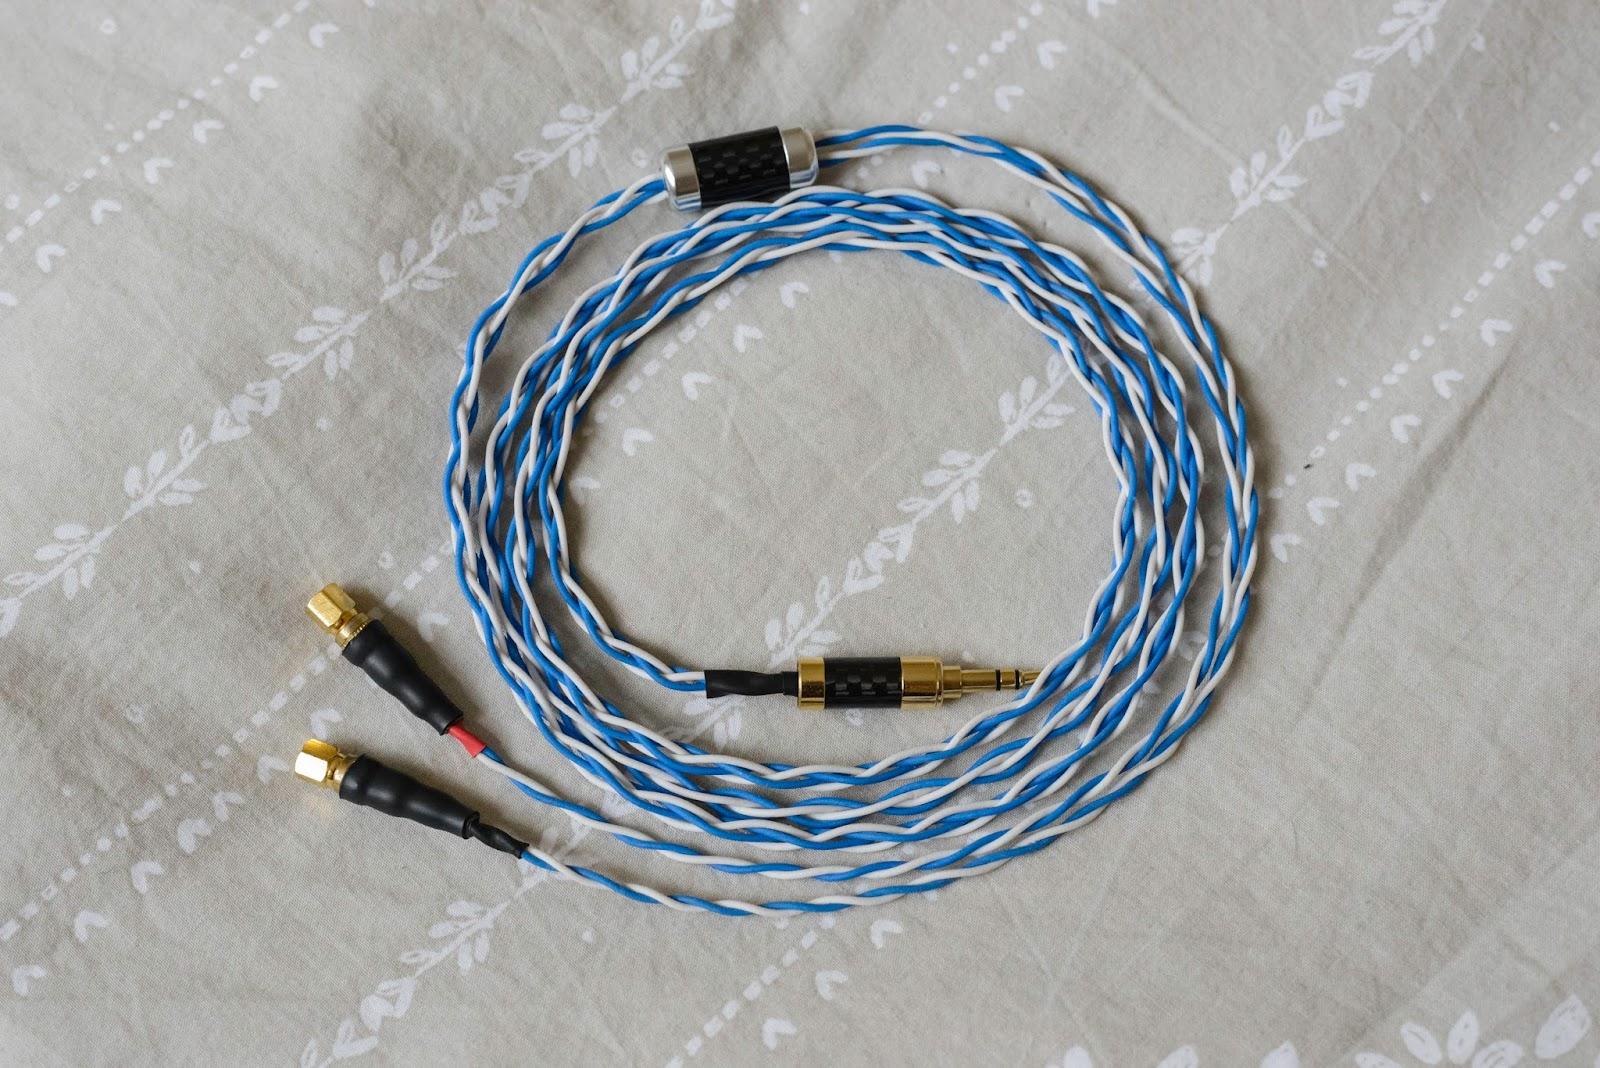 Custom Made Cables